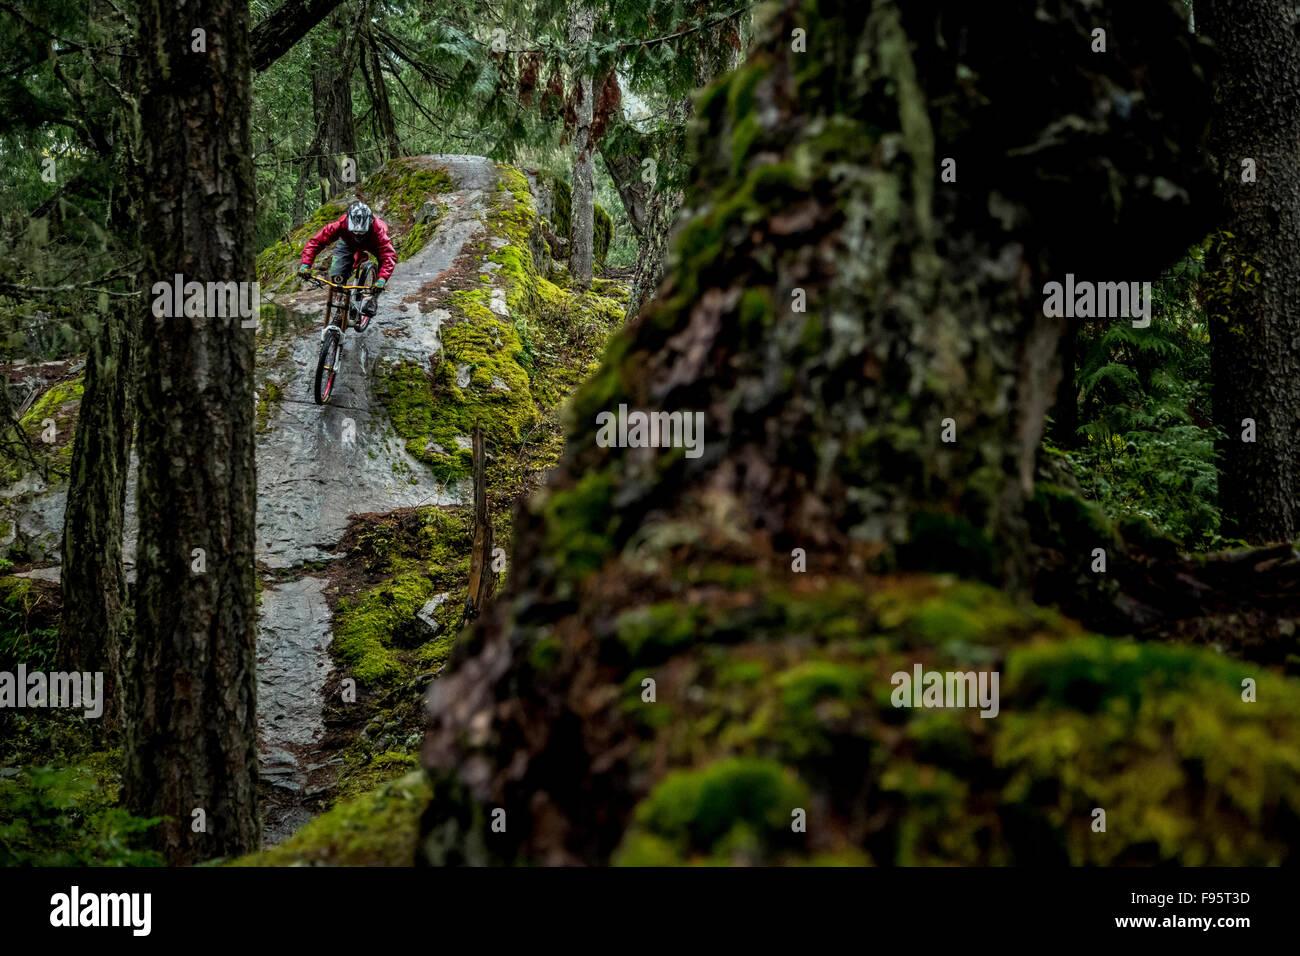 Mountain Biking, Lower yer Saddle, Whistler, British Columbia, Canada - Stock Image